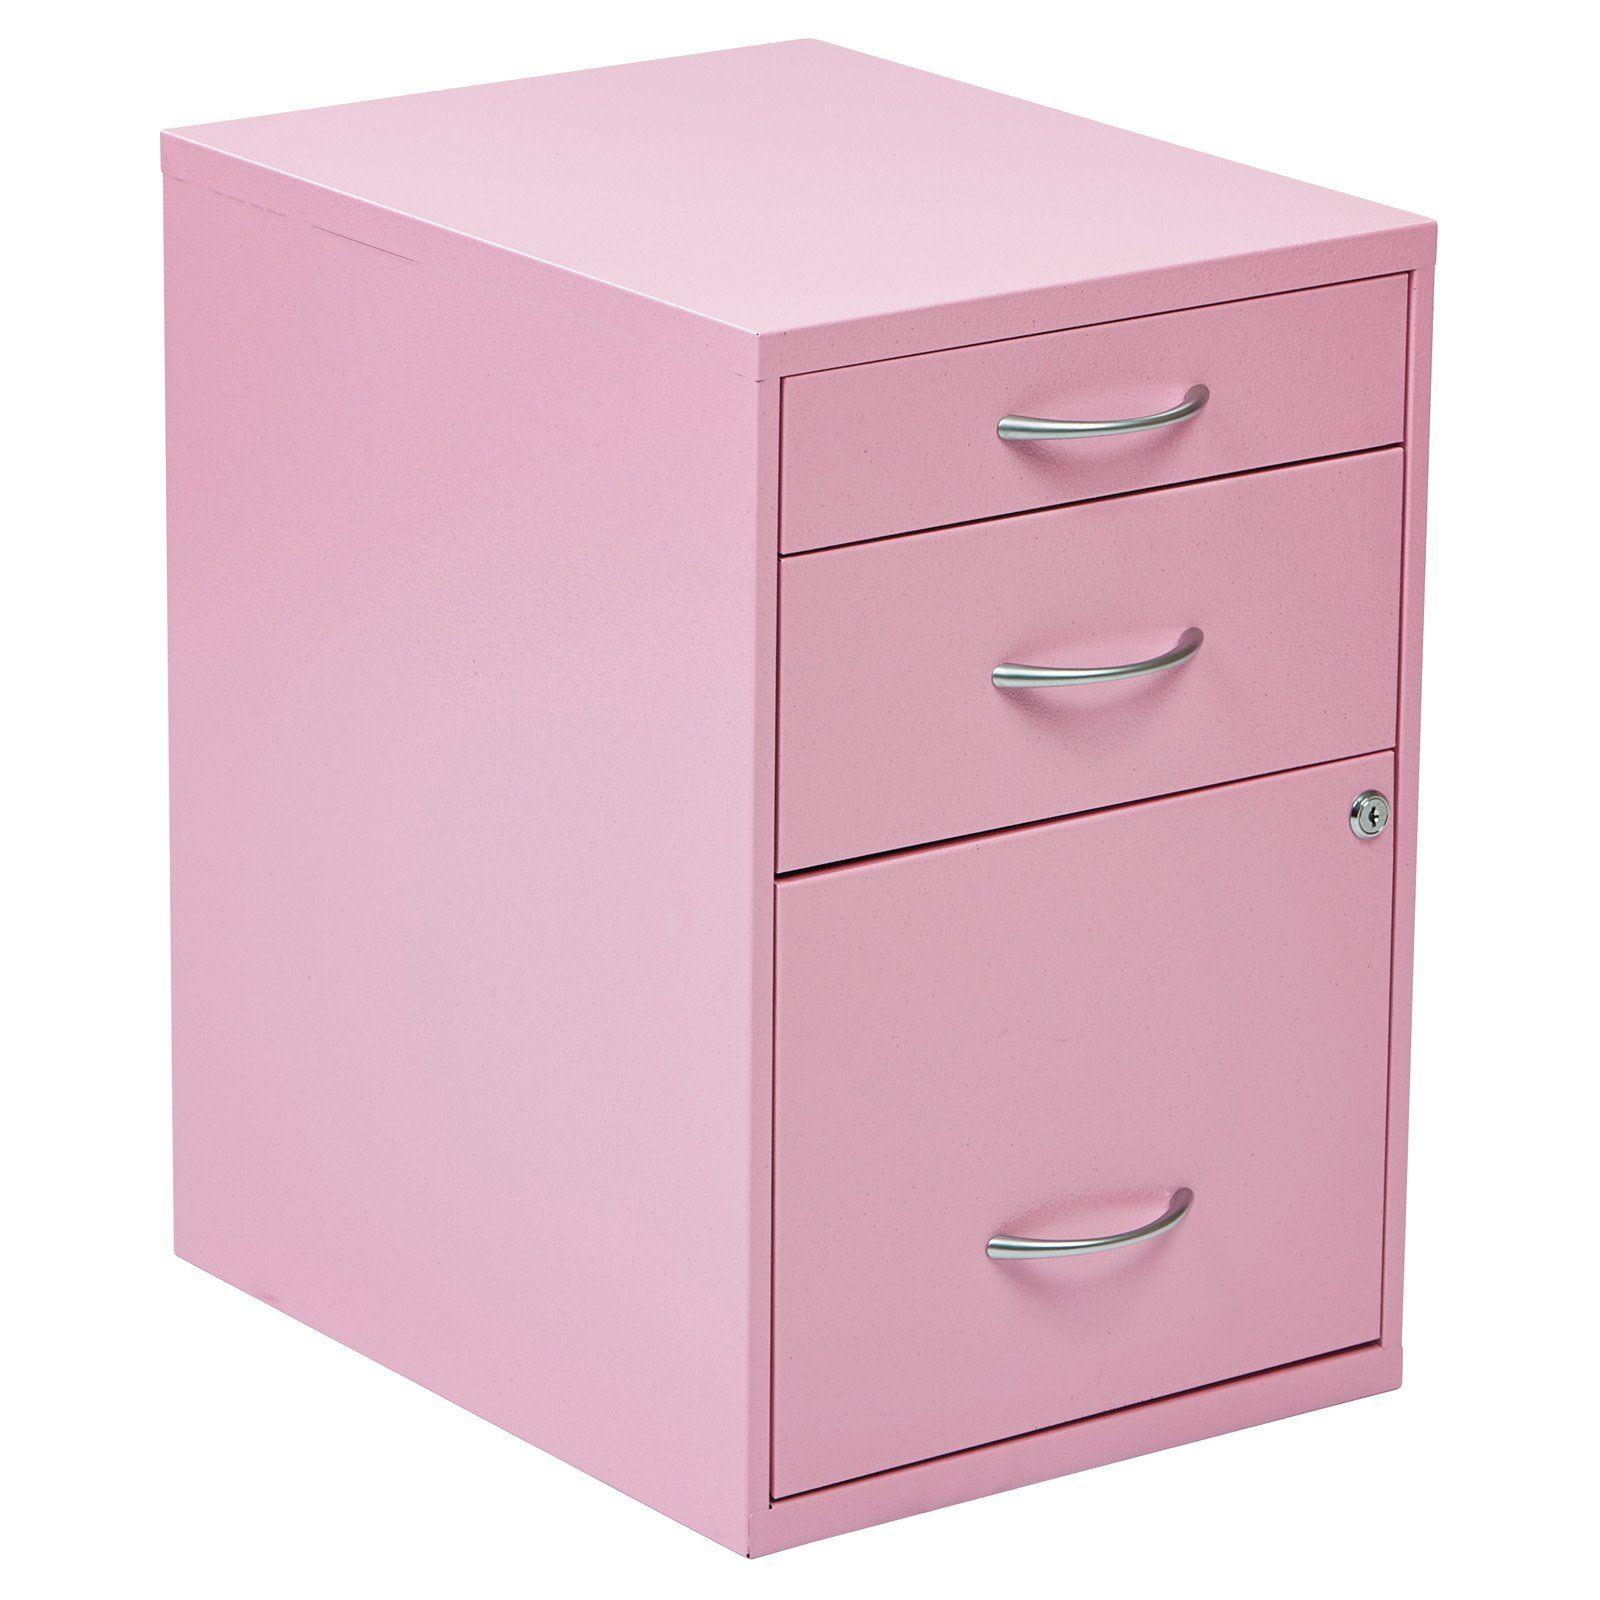 3 Drawer Vertical Metal Lockable Filing Cabinet Pink Walmart Com In 2020 Filing Cabinet Metal Filing Cabinet Steel Storage Cabinets